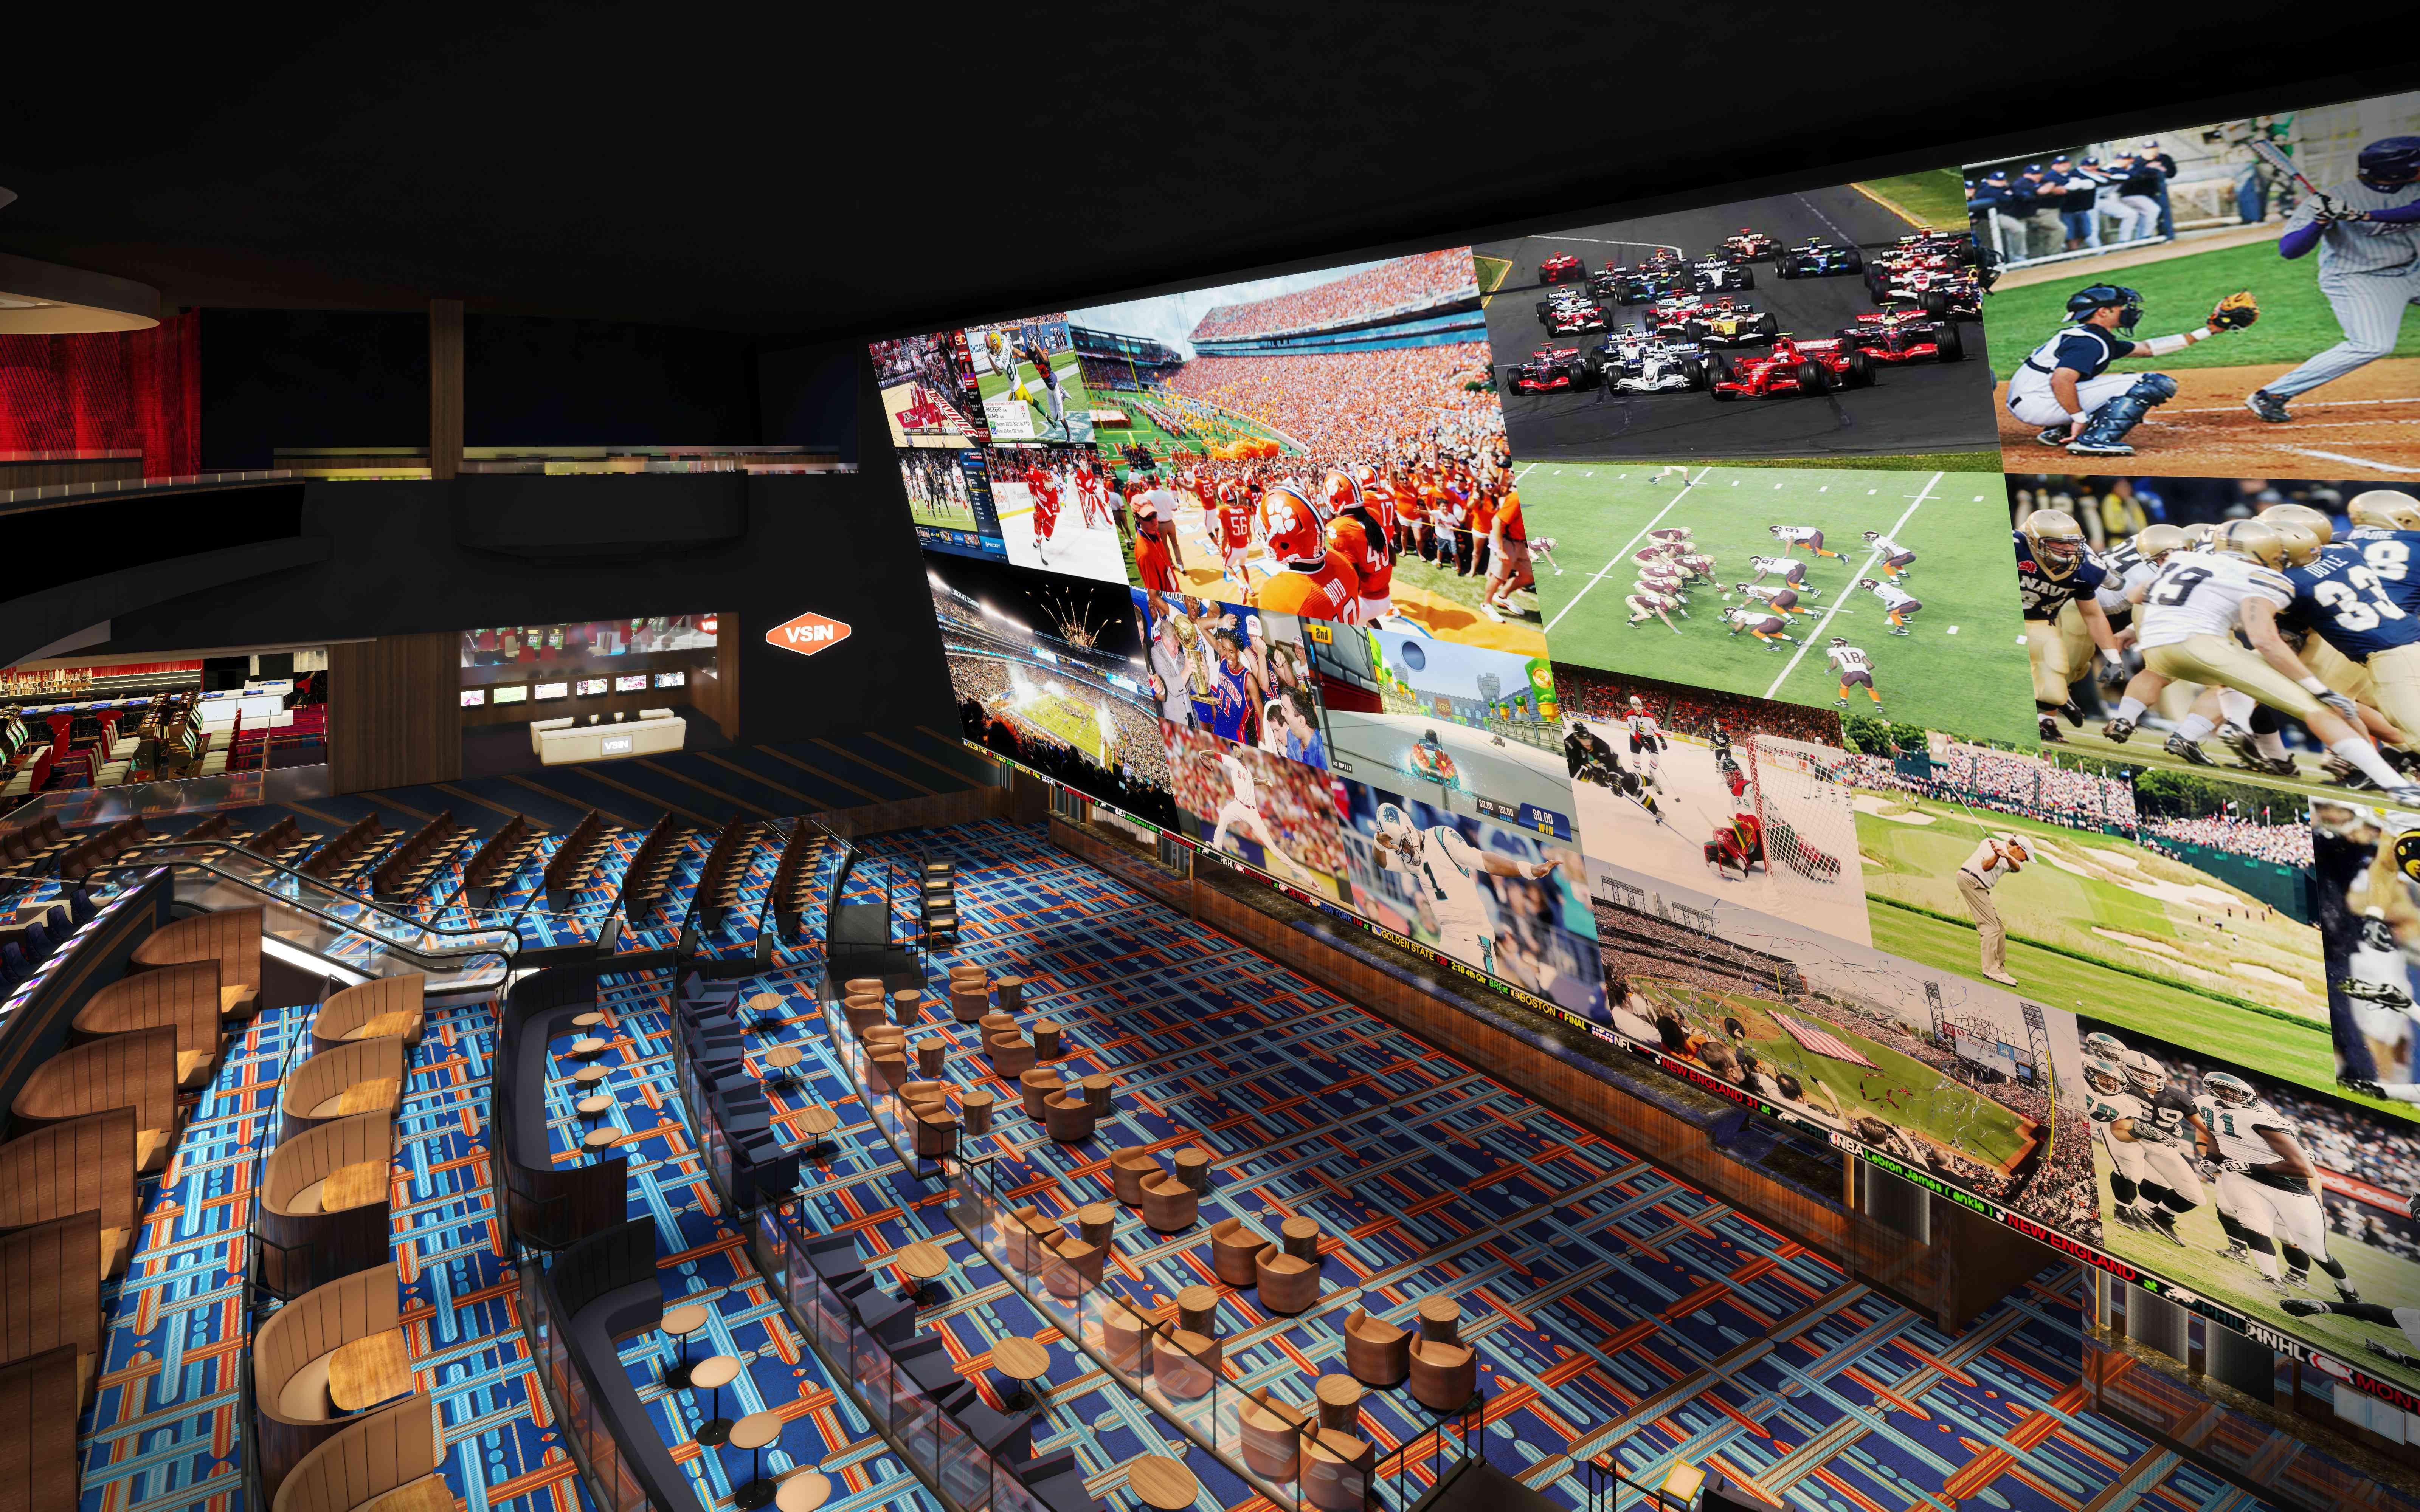 The world's largest sportsbook, Circa Resort & Casino